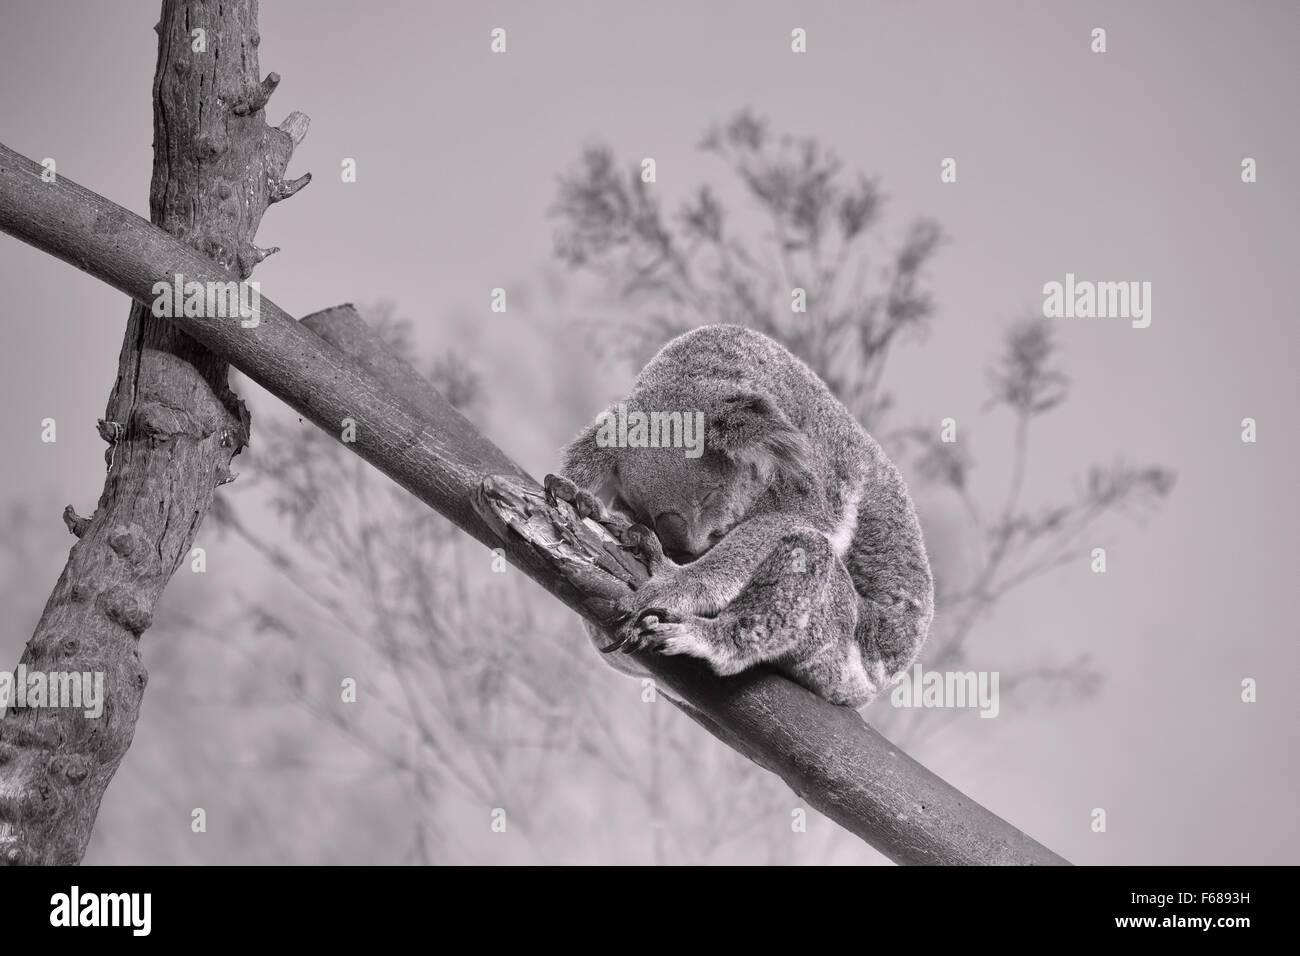 Sleeping Koala Bear - Stock Image